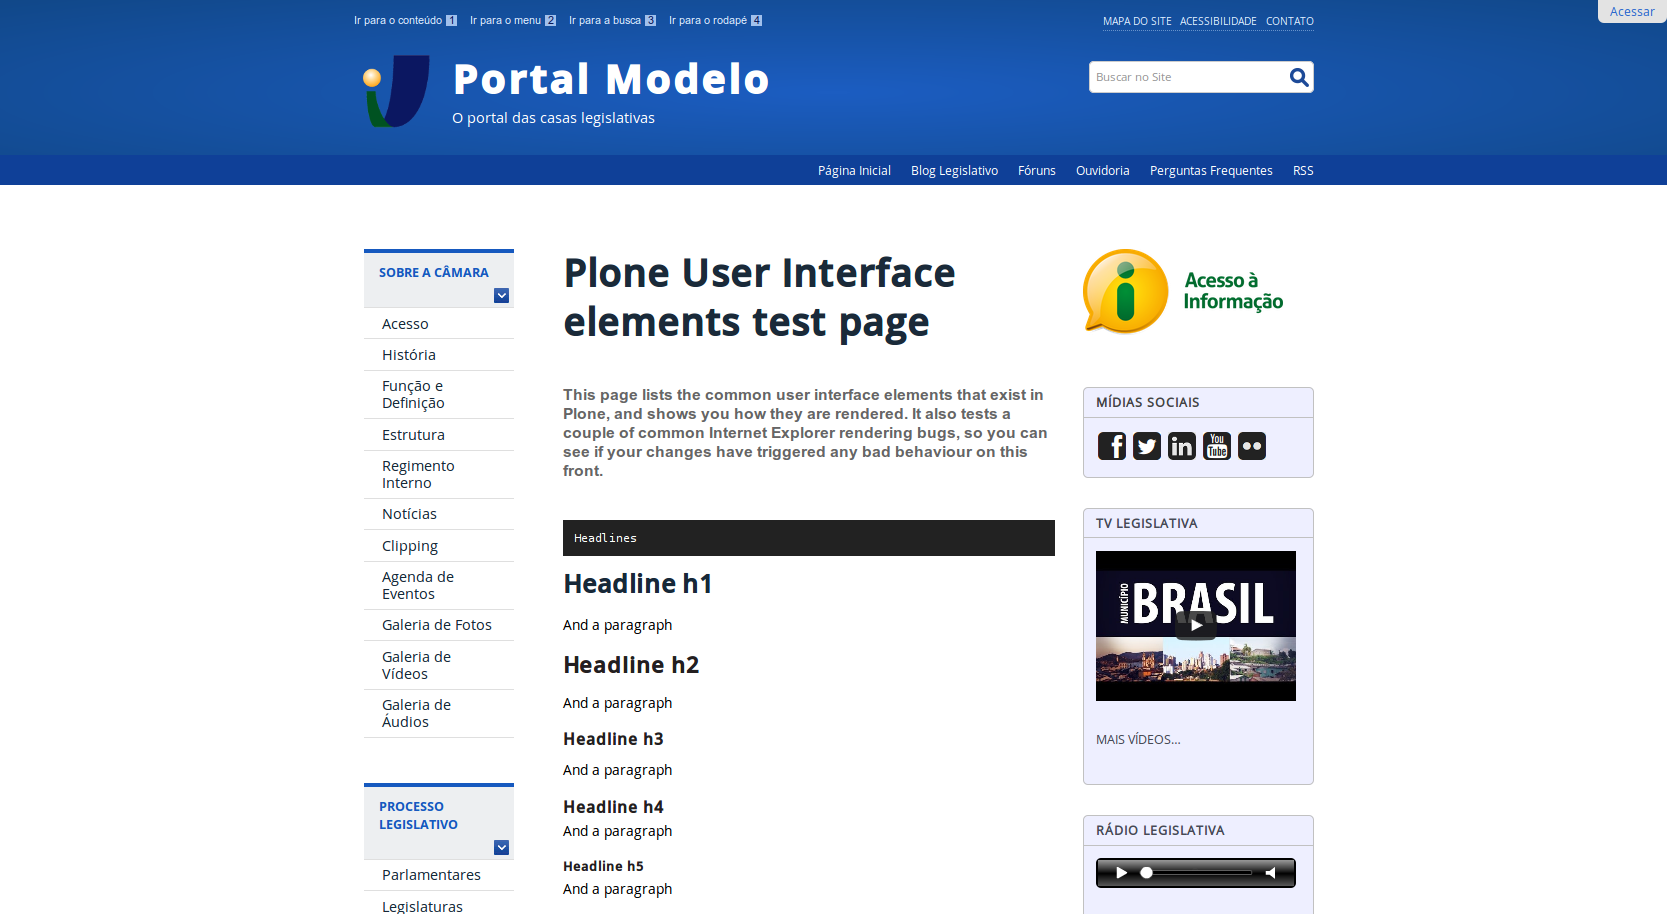 https://raw.githubusercontent.com/interlegis/interlegis.portalmodelo.theme/master/src/interlegis/portalmodelo/theme/themes/IDG-azul/preview.png